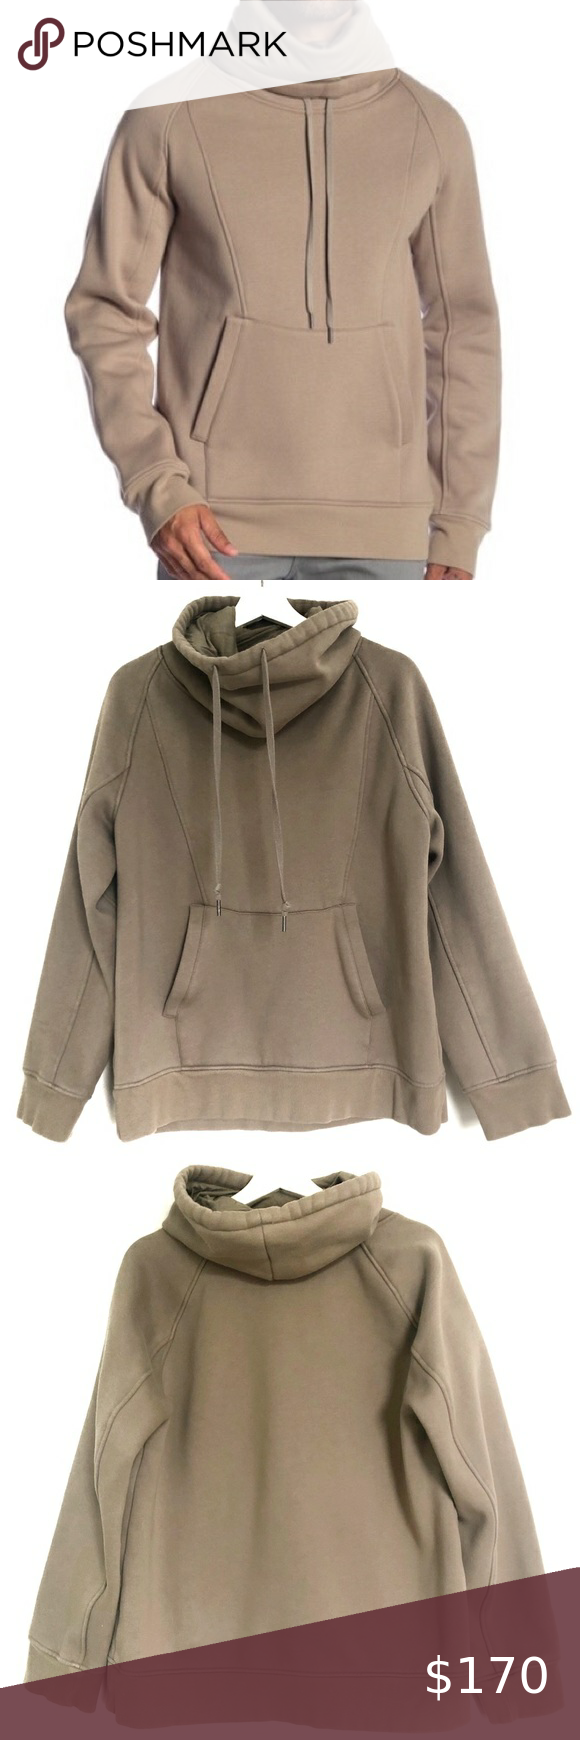 Helmut Lang Men S L Cowl Neck Hooded Sweatshirt Clothes Design Fashion Fashion Tips [ 1740 x 580 Pixel ]